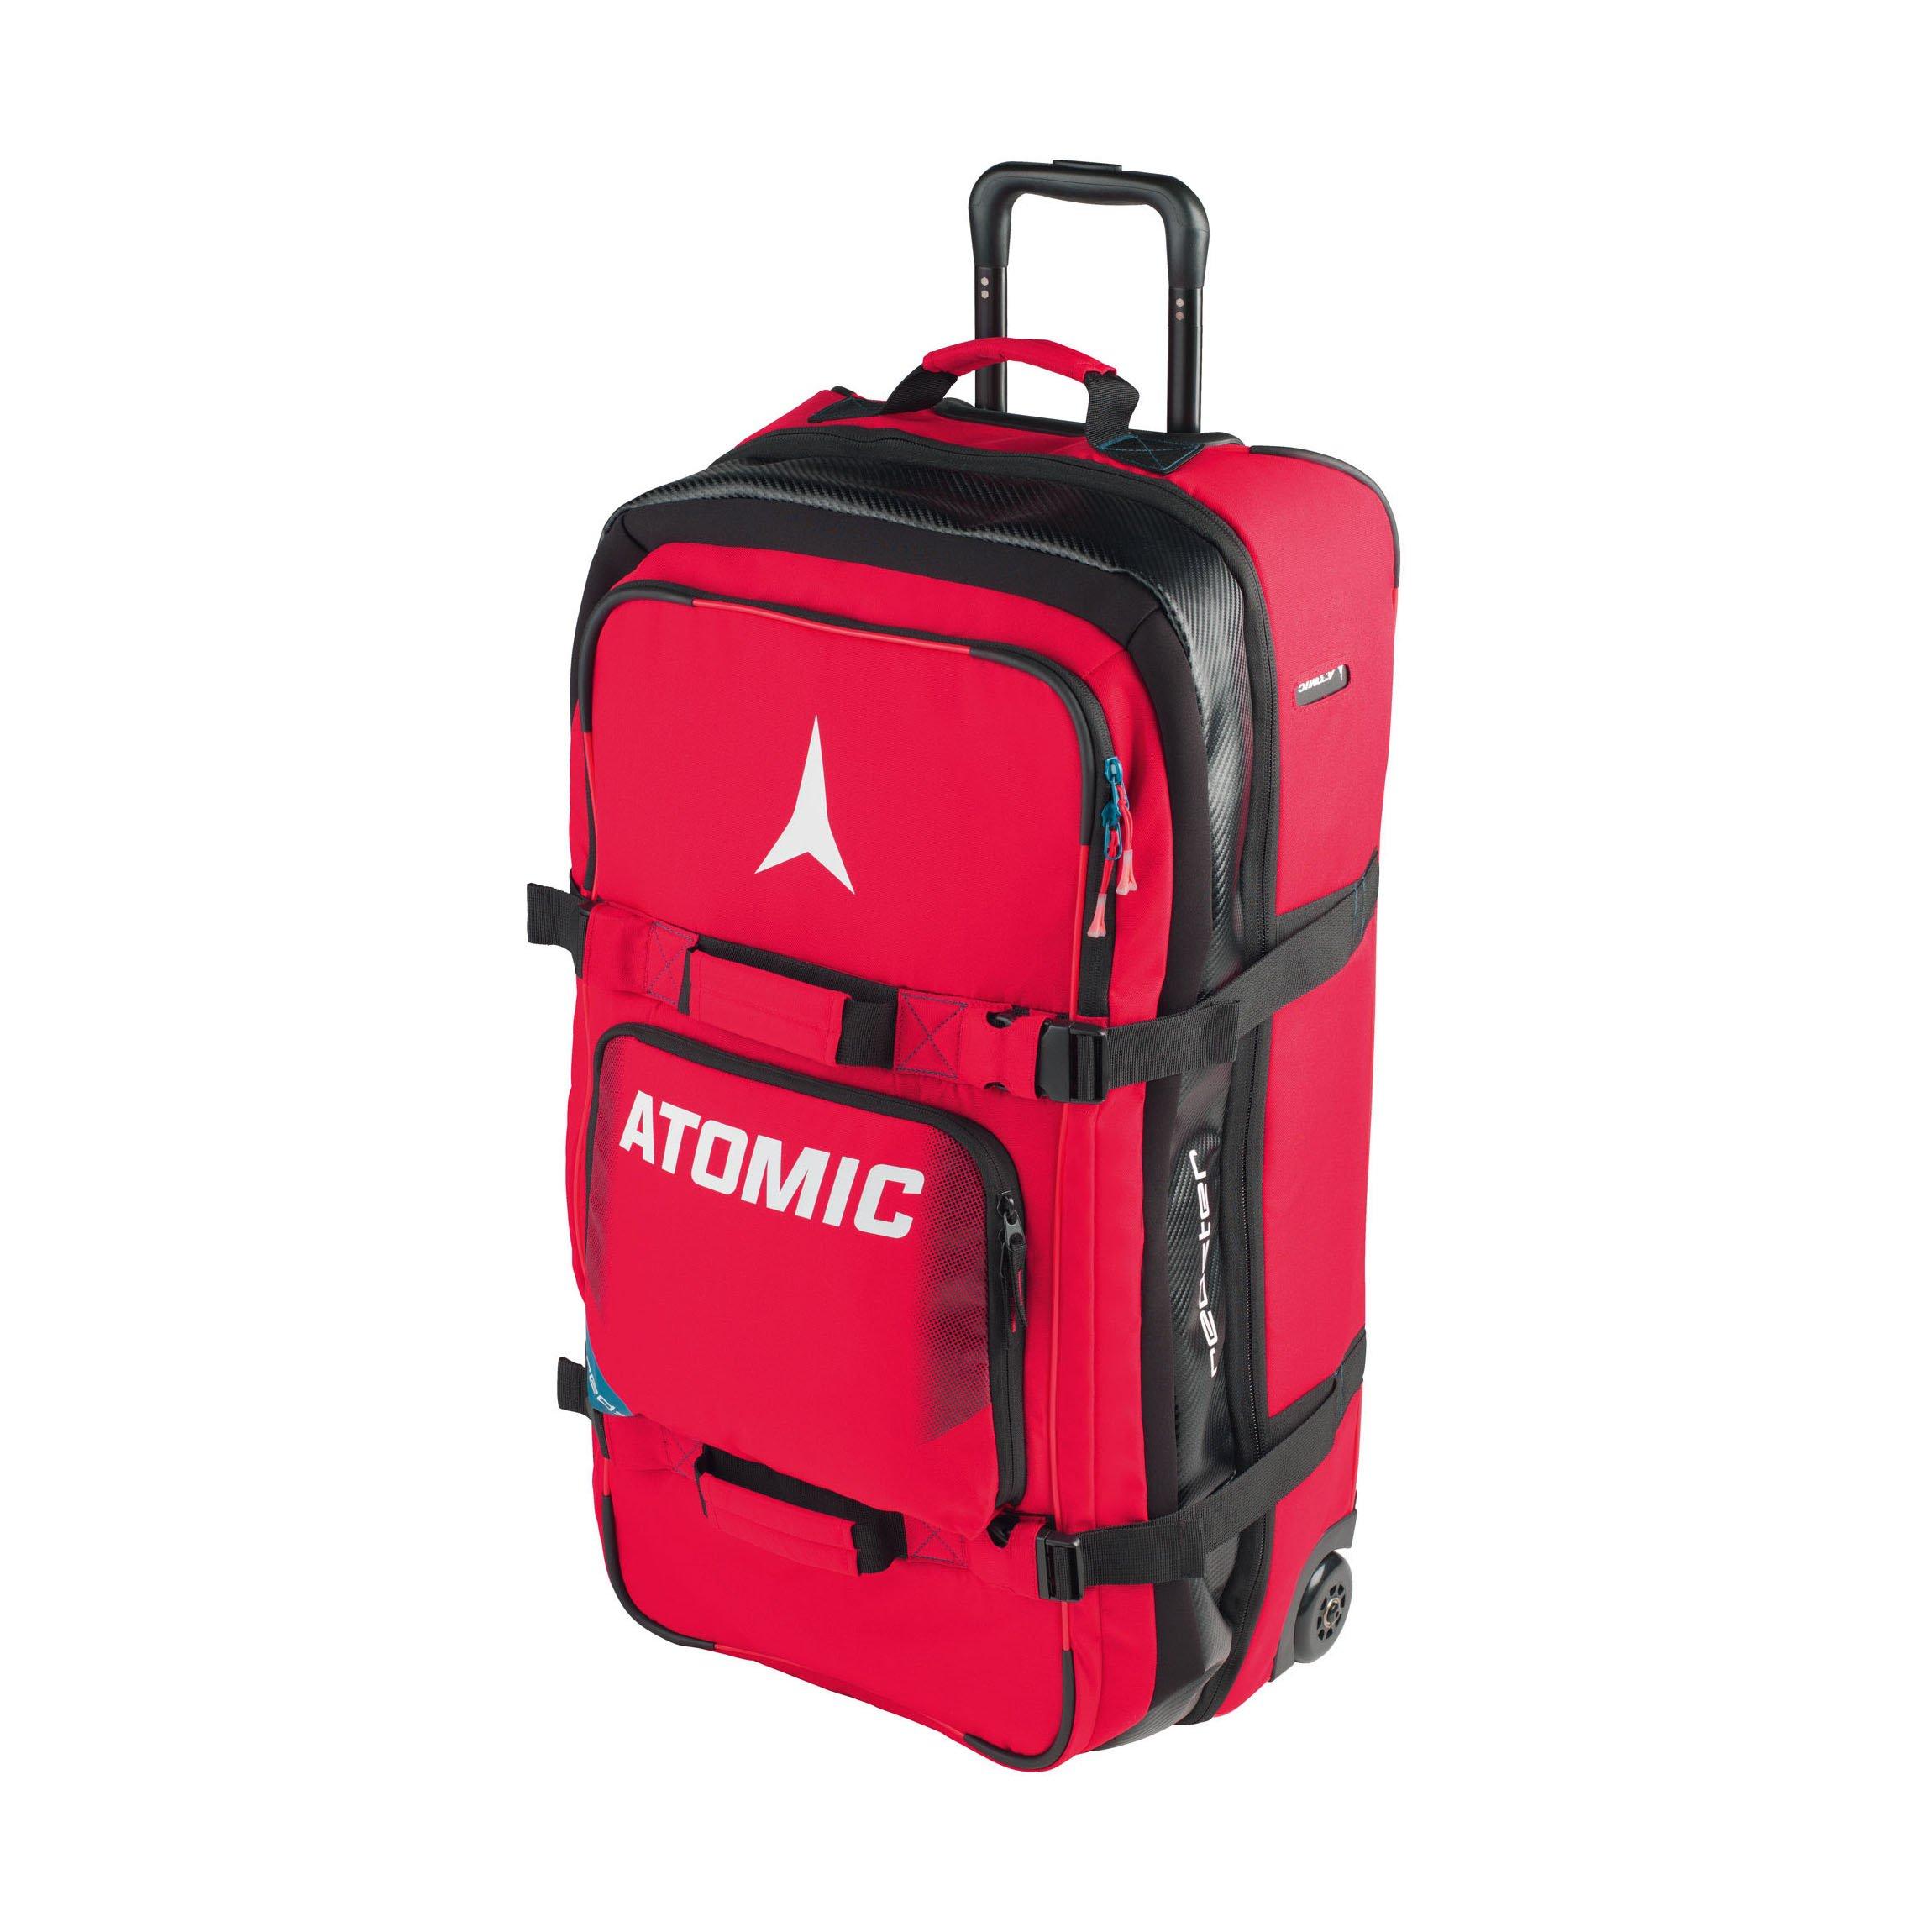 Atomic Redster Ski Gear Travel Bag Červená 85 L 2015-2016